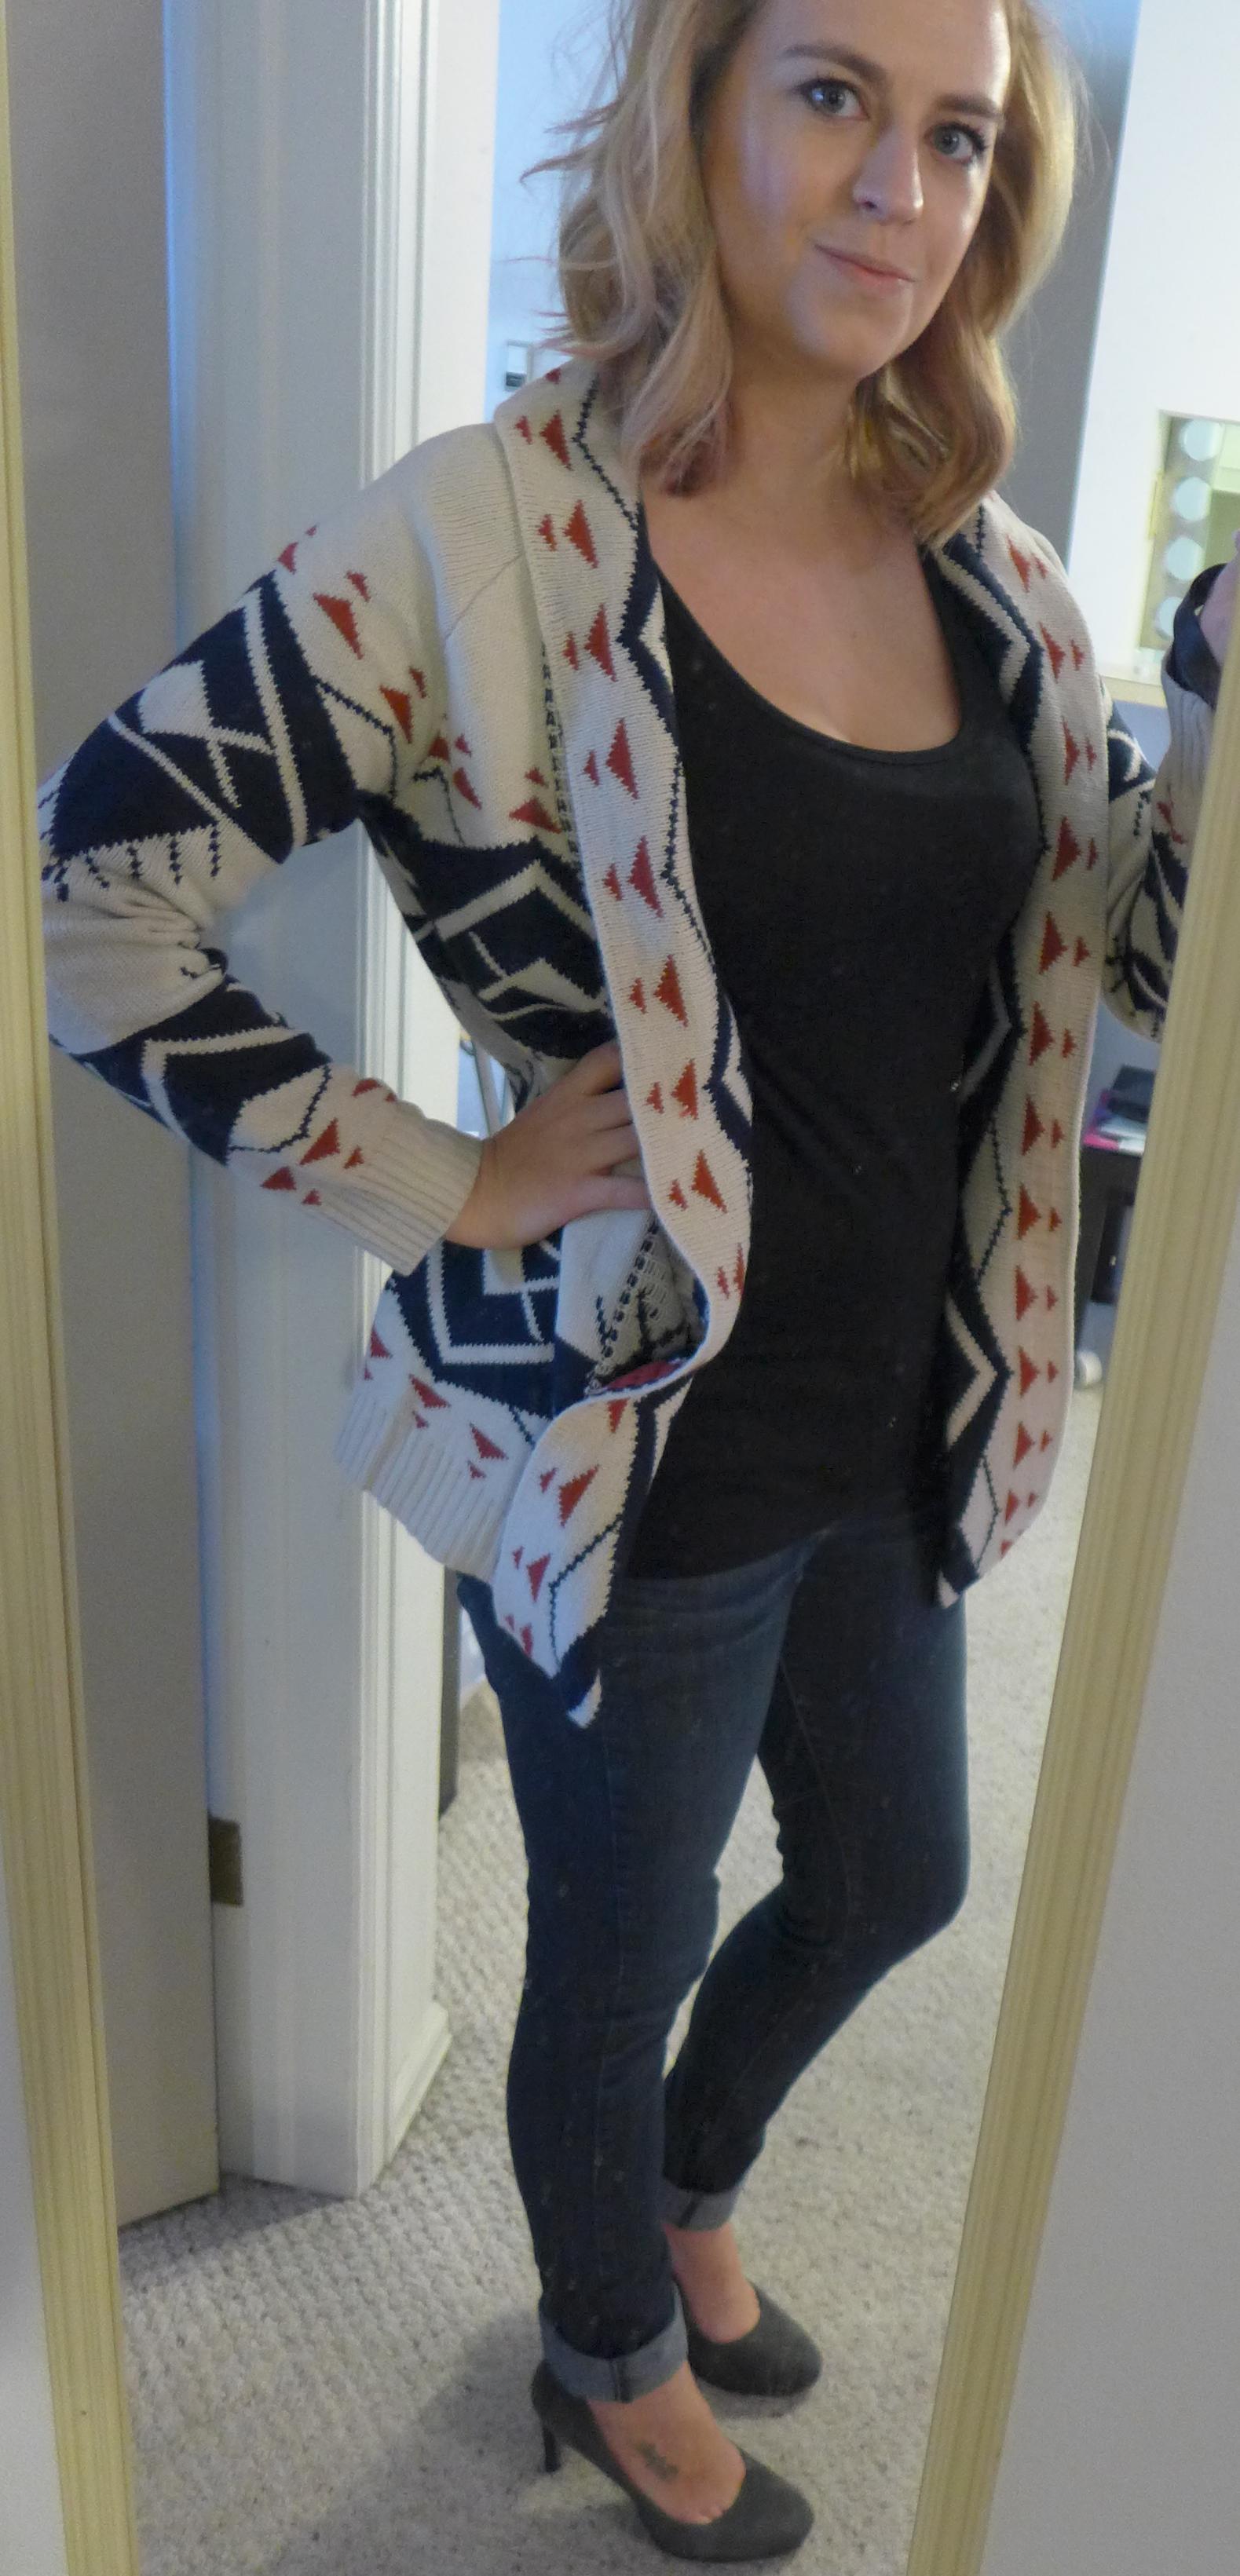 Fate Garvey Tribal Print Open Front Cardigan - Monika wearing front view - Stitch Fix